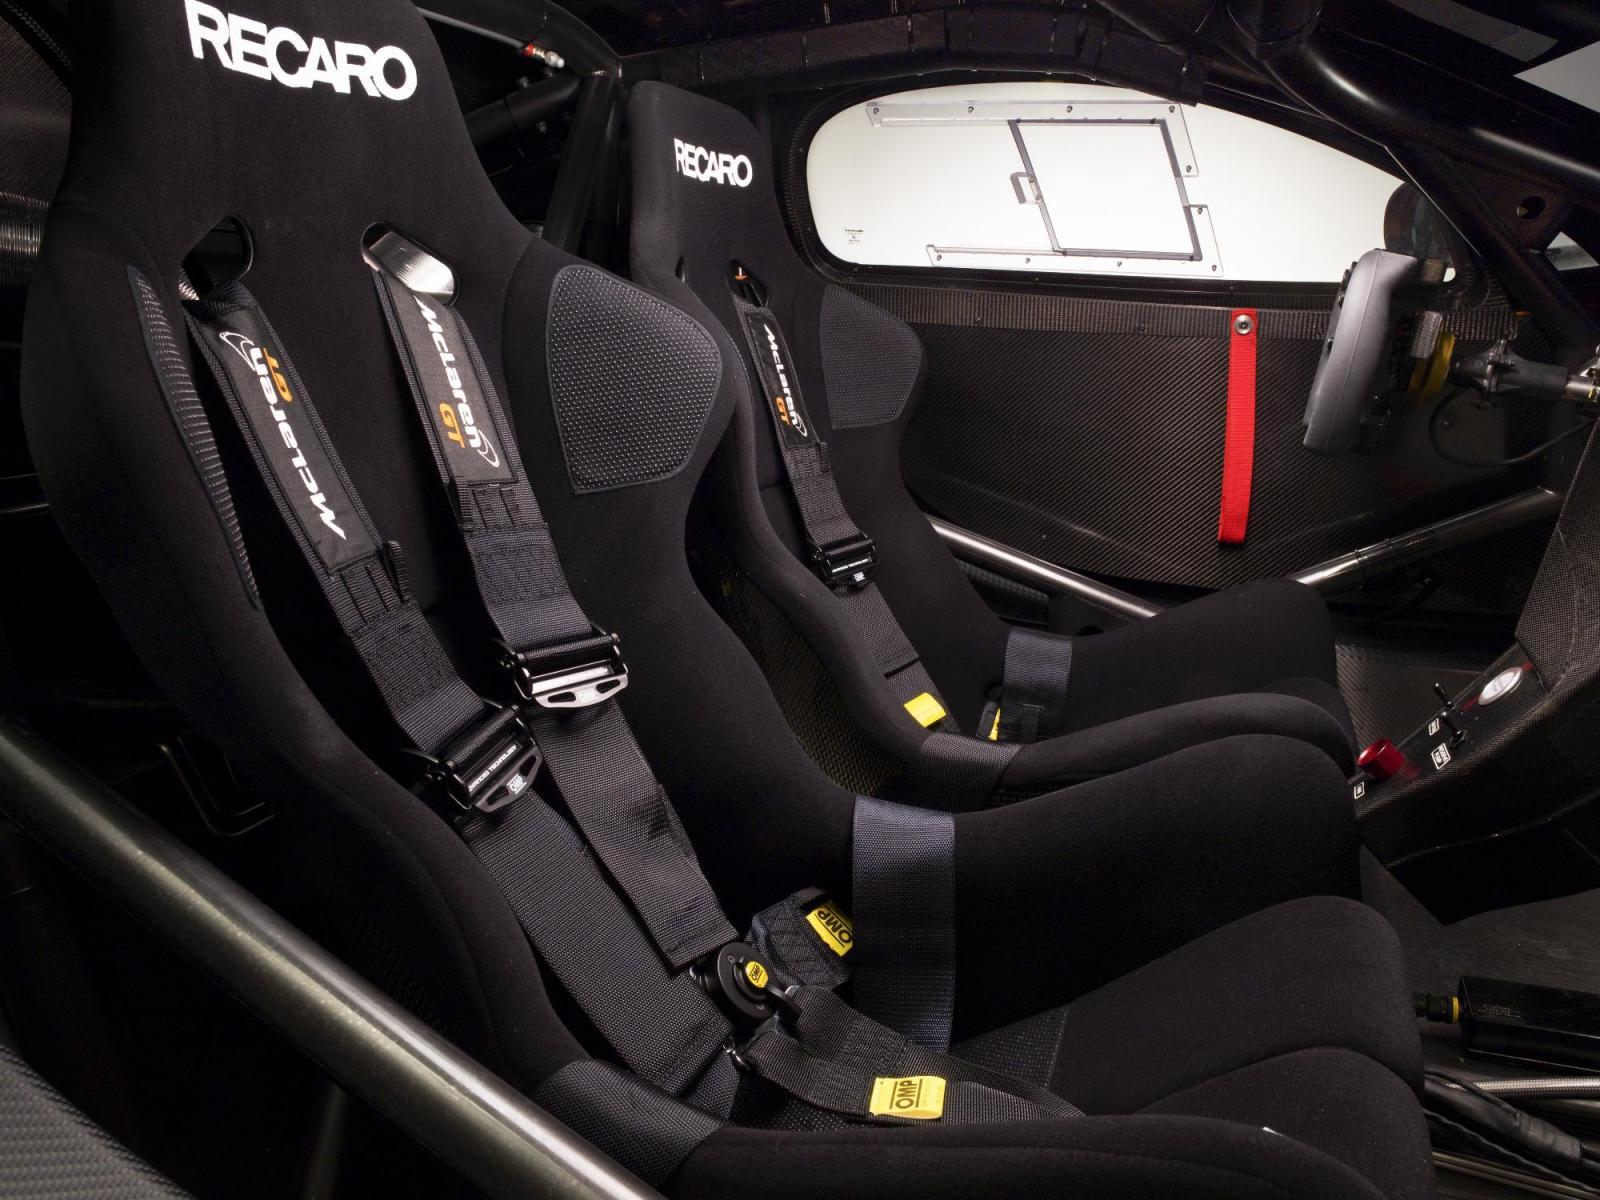 http://images.caradisiac.com/images/0/3/5/5/80355/S0-McLaren-MP4-12C-Cam-Am-Edition-Racing-Concept-268720.jpg